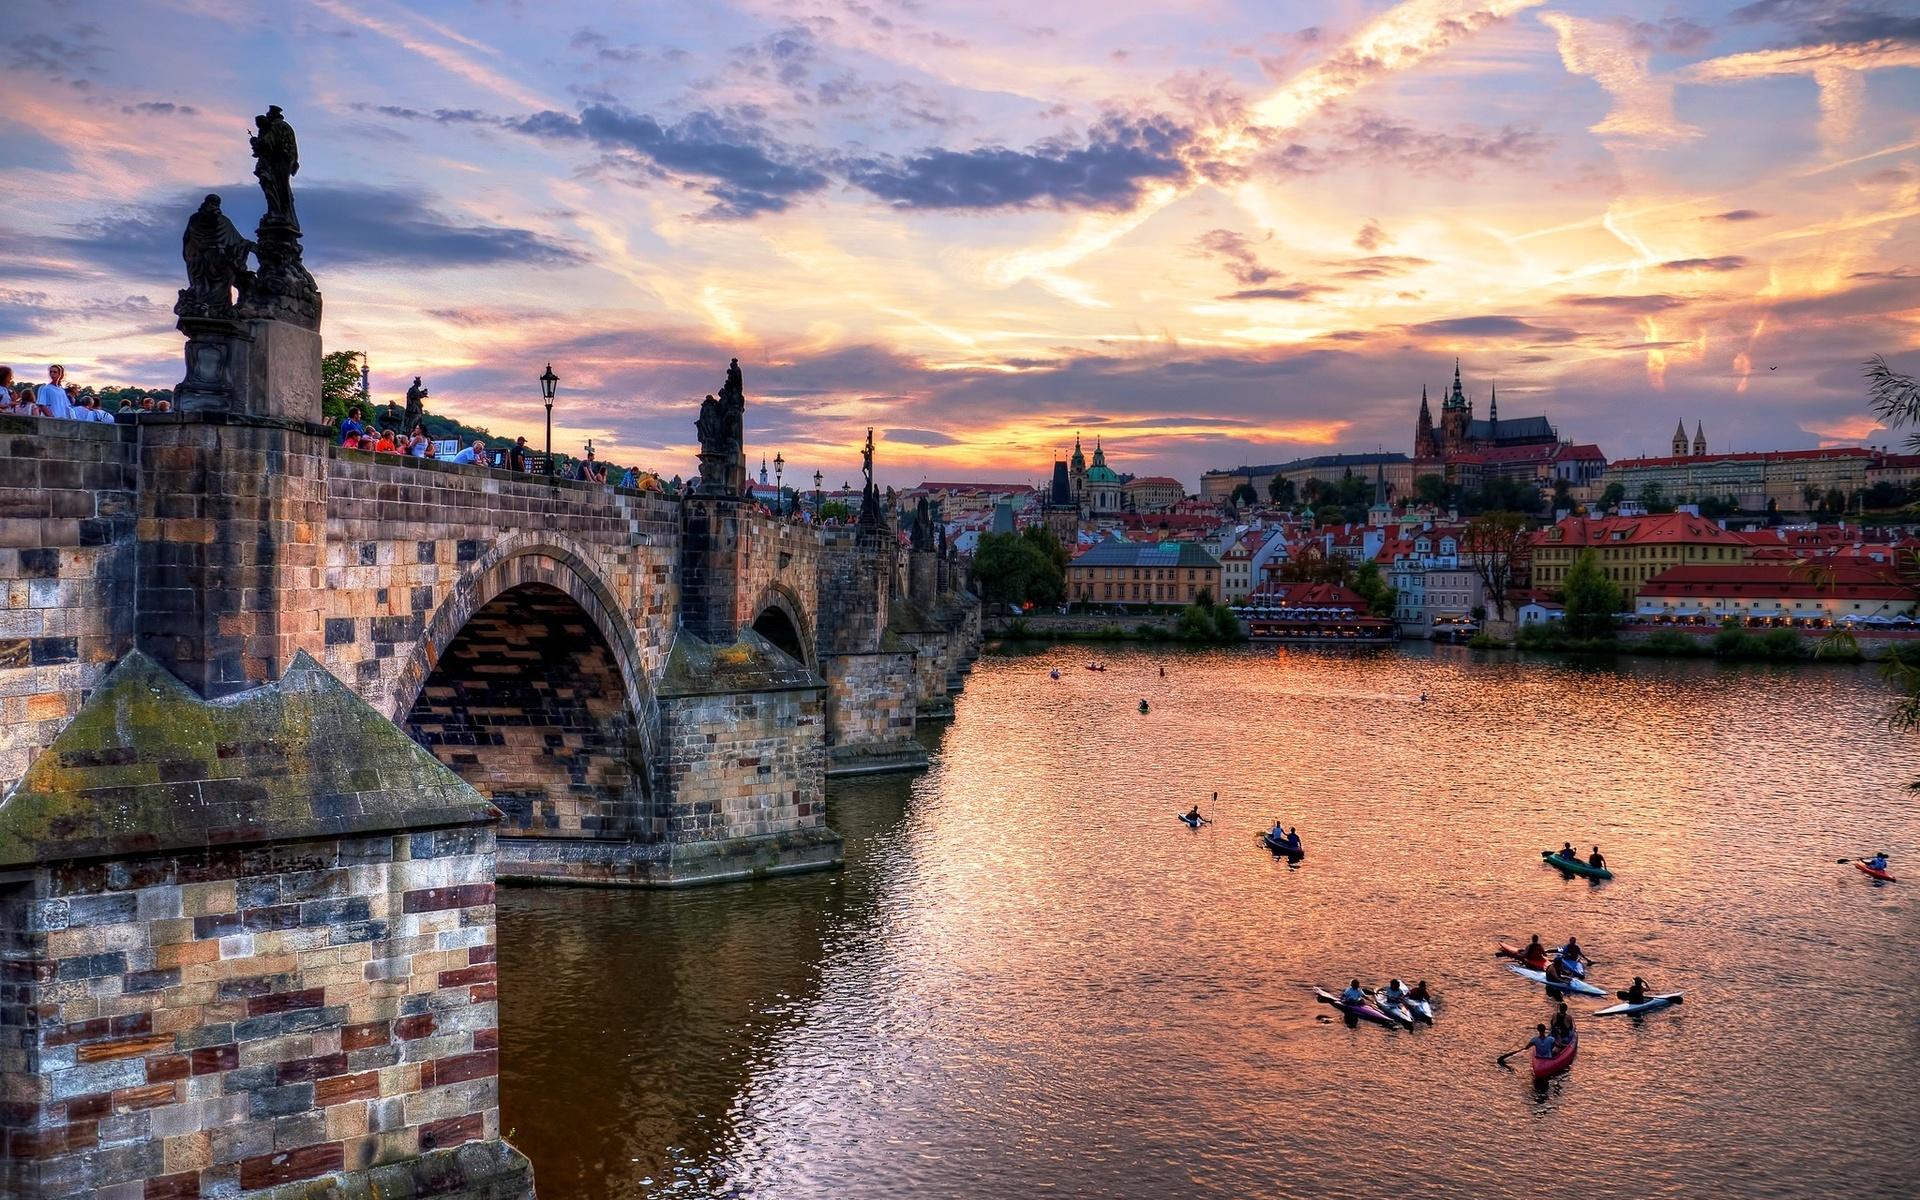 Prague HD Wallpaper Background Image 1920x1200 ID374028 1920x1200